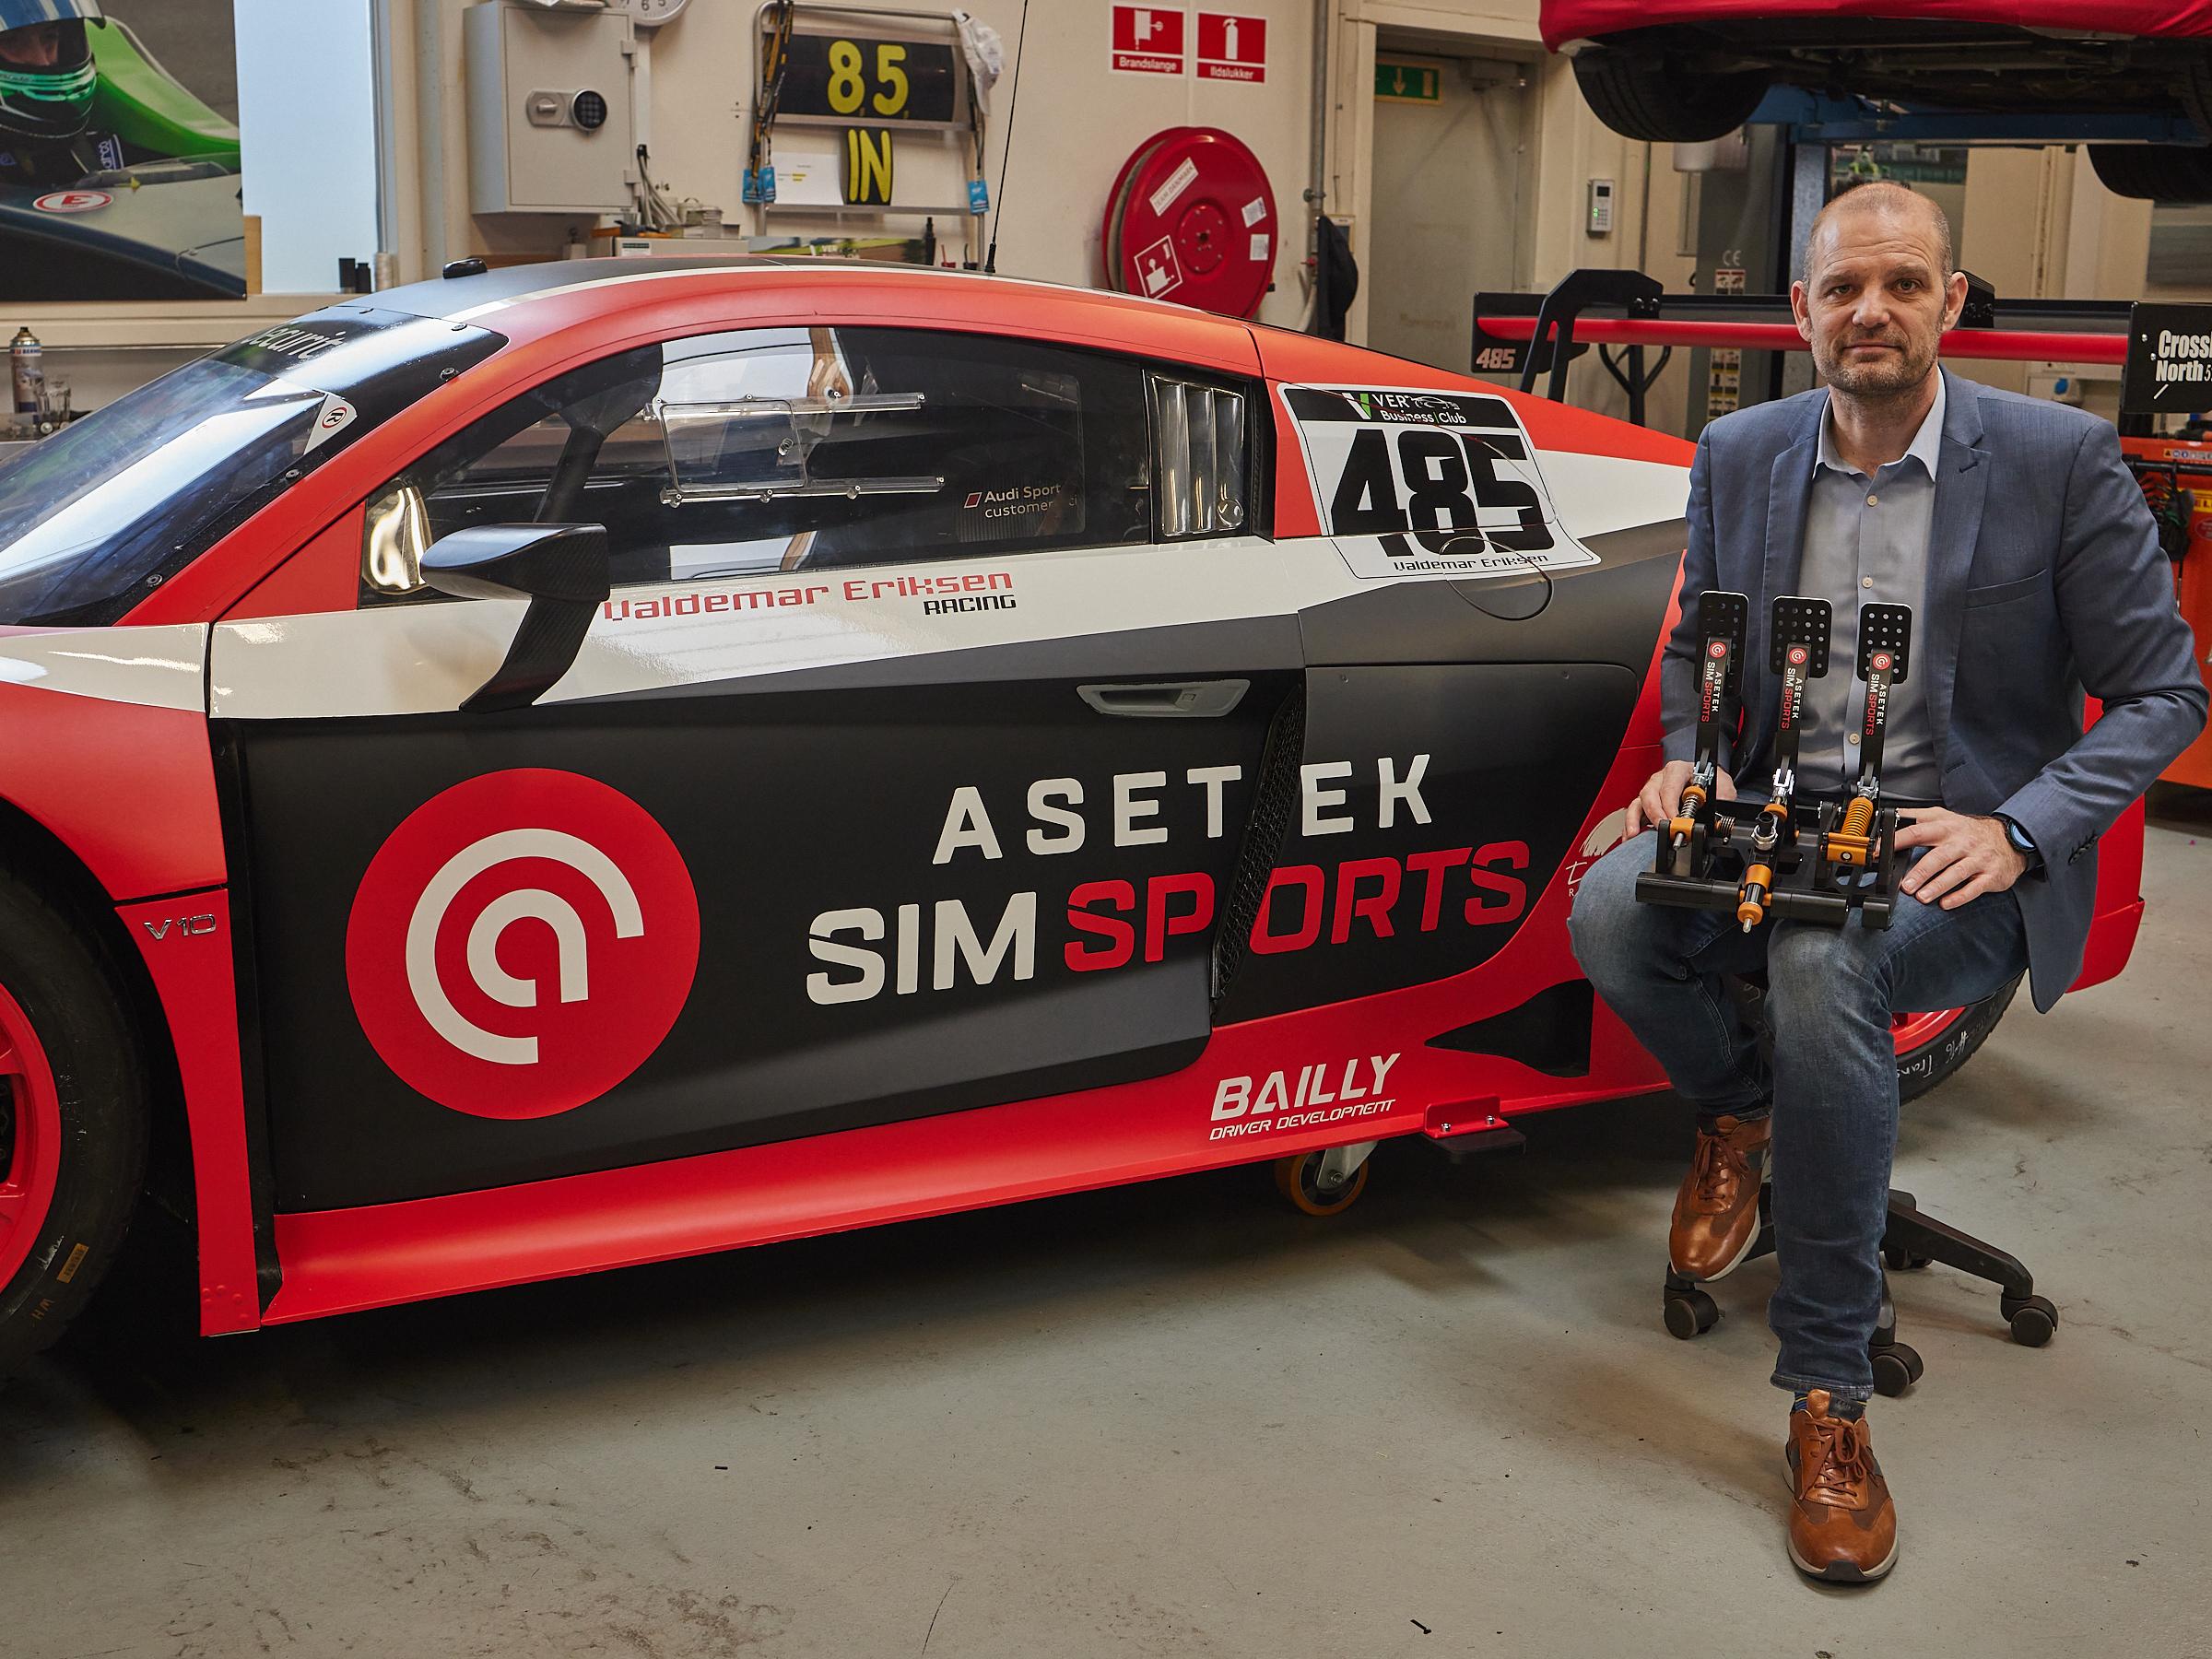 Aalborg-firma med global satsning: Asetek vil udvikle verdens bedste racingsimulatorer